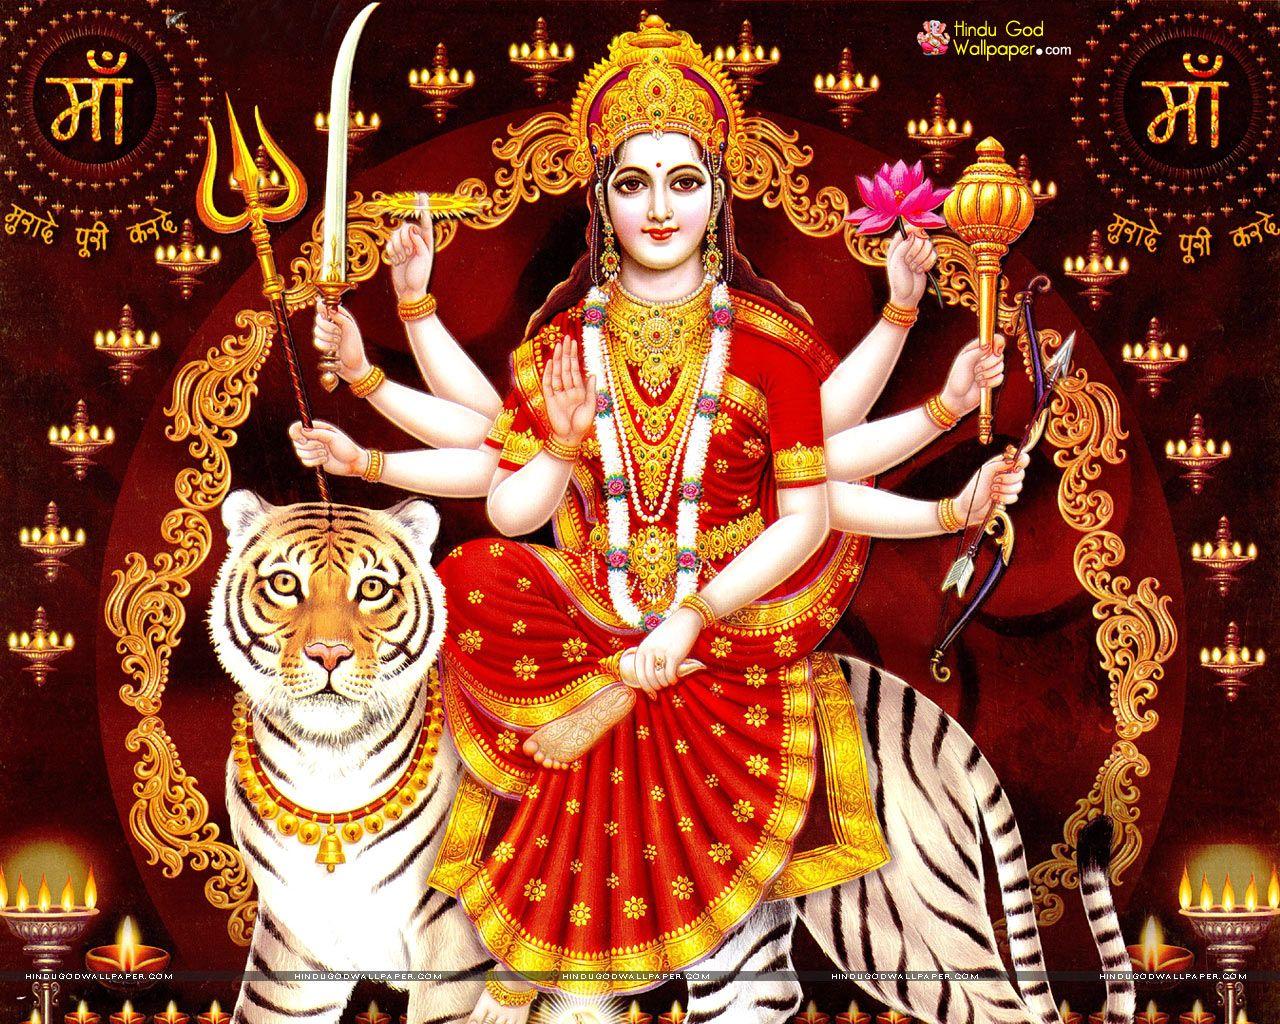 Wallpaper download karna hai - Mata Vaishno Devi Hd Wallpapers Download